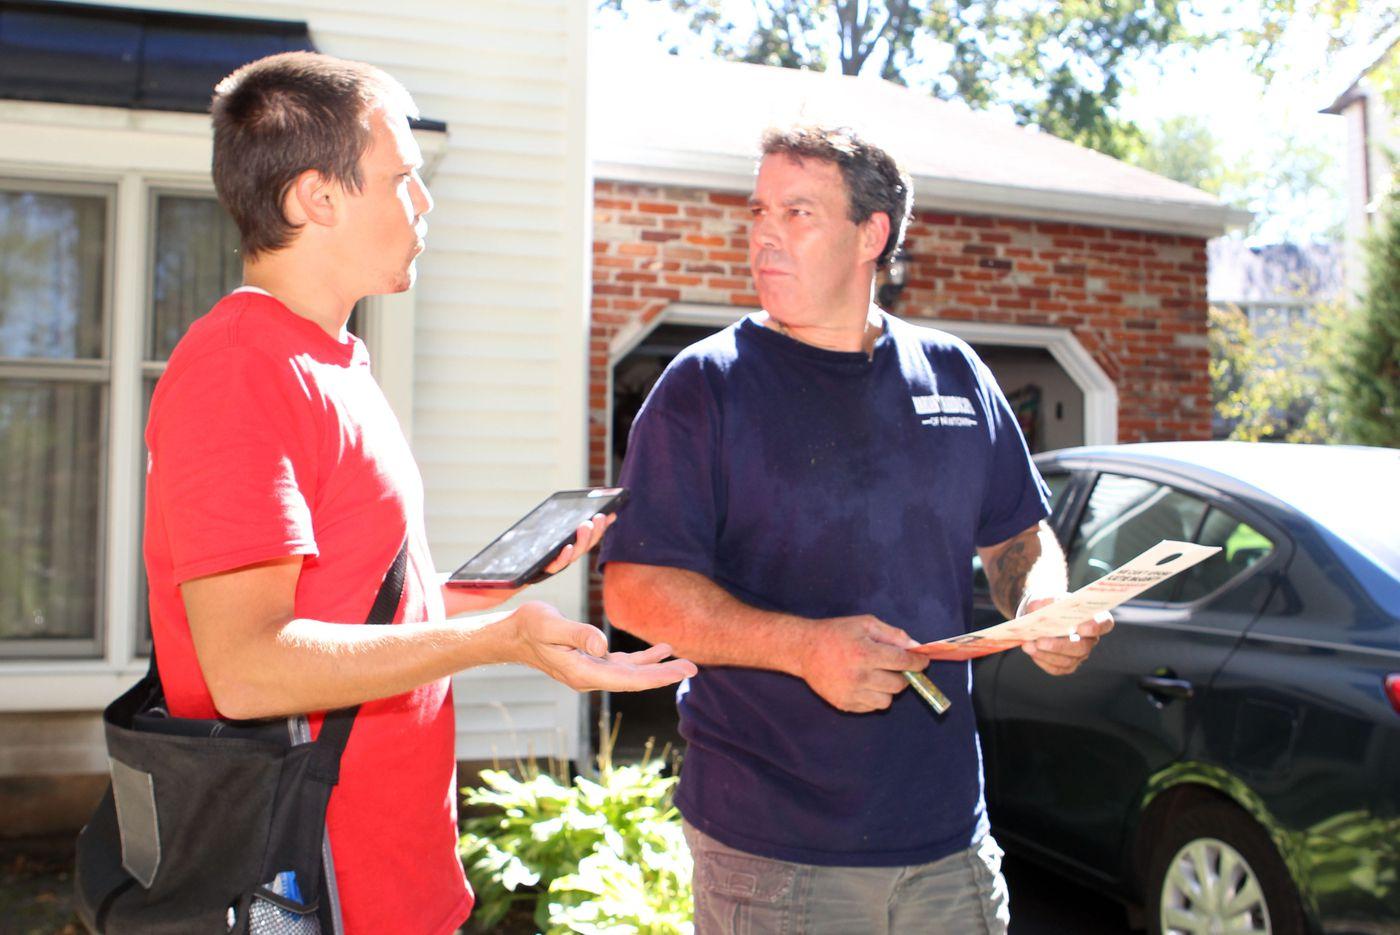 Koch-linked conservative activist group backs Scott Wagner for Pa. governor